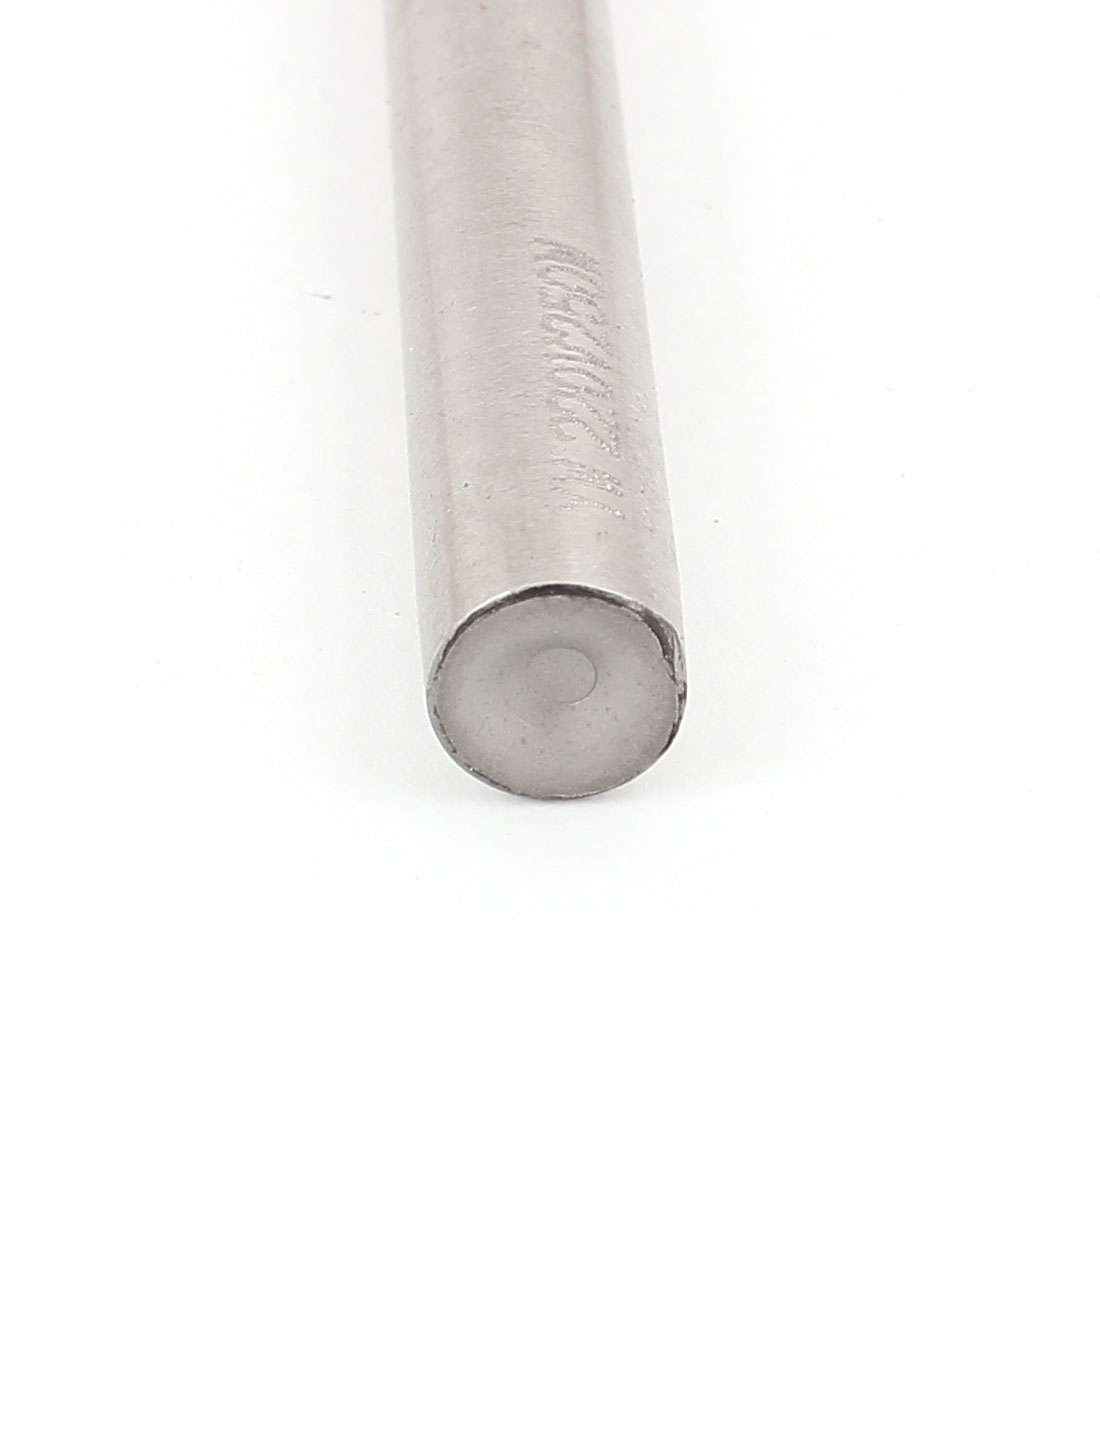 220V 200W Industry Mold Cartridge Heater Heating Element 9.5mm x 60mm 3Pcs